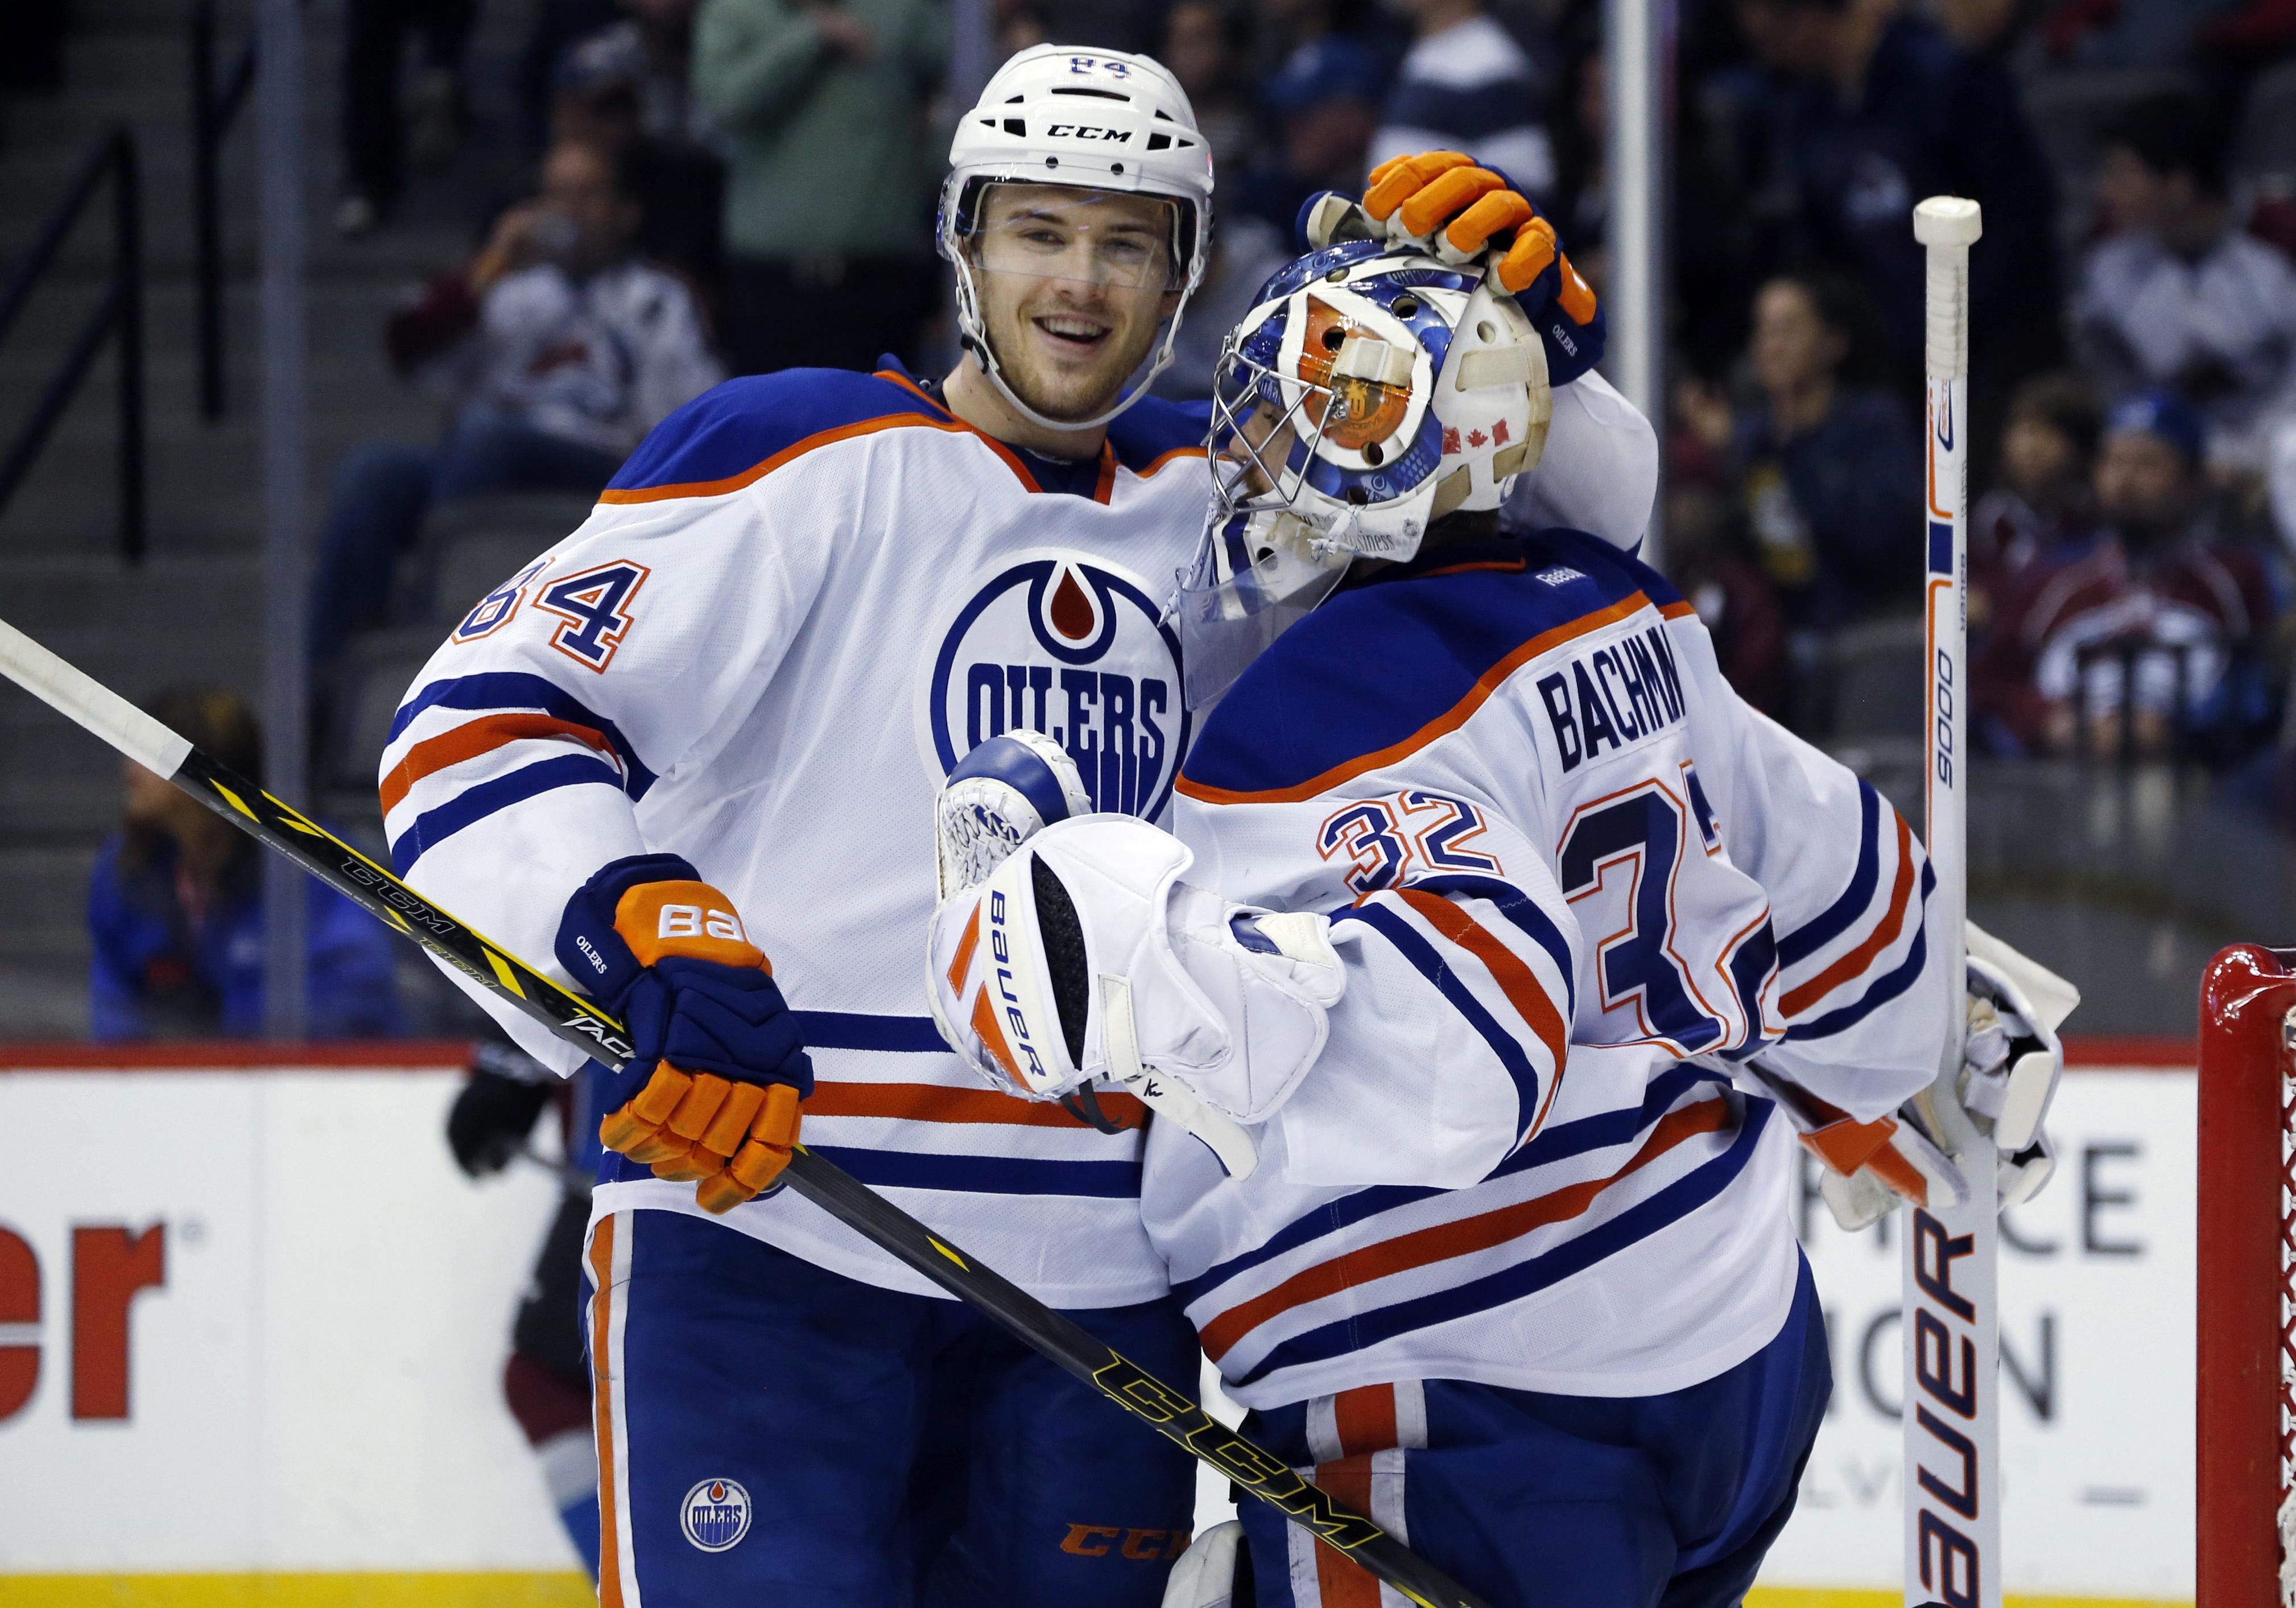 Edmonton Oilers defenseman Oscar Klefbom, left, of Sweden, congratulates goalie Richard Bachman as time runs out in the third period of an NHL hockey game against the Colorado Avalanche, Monday, March 30, 2015, in Denver. The Oilers won 4-1. (AP Photo/Dav